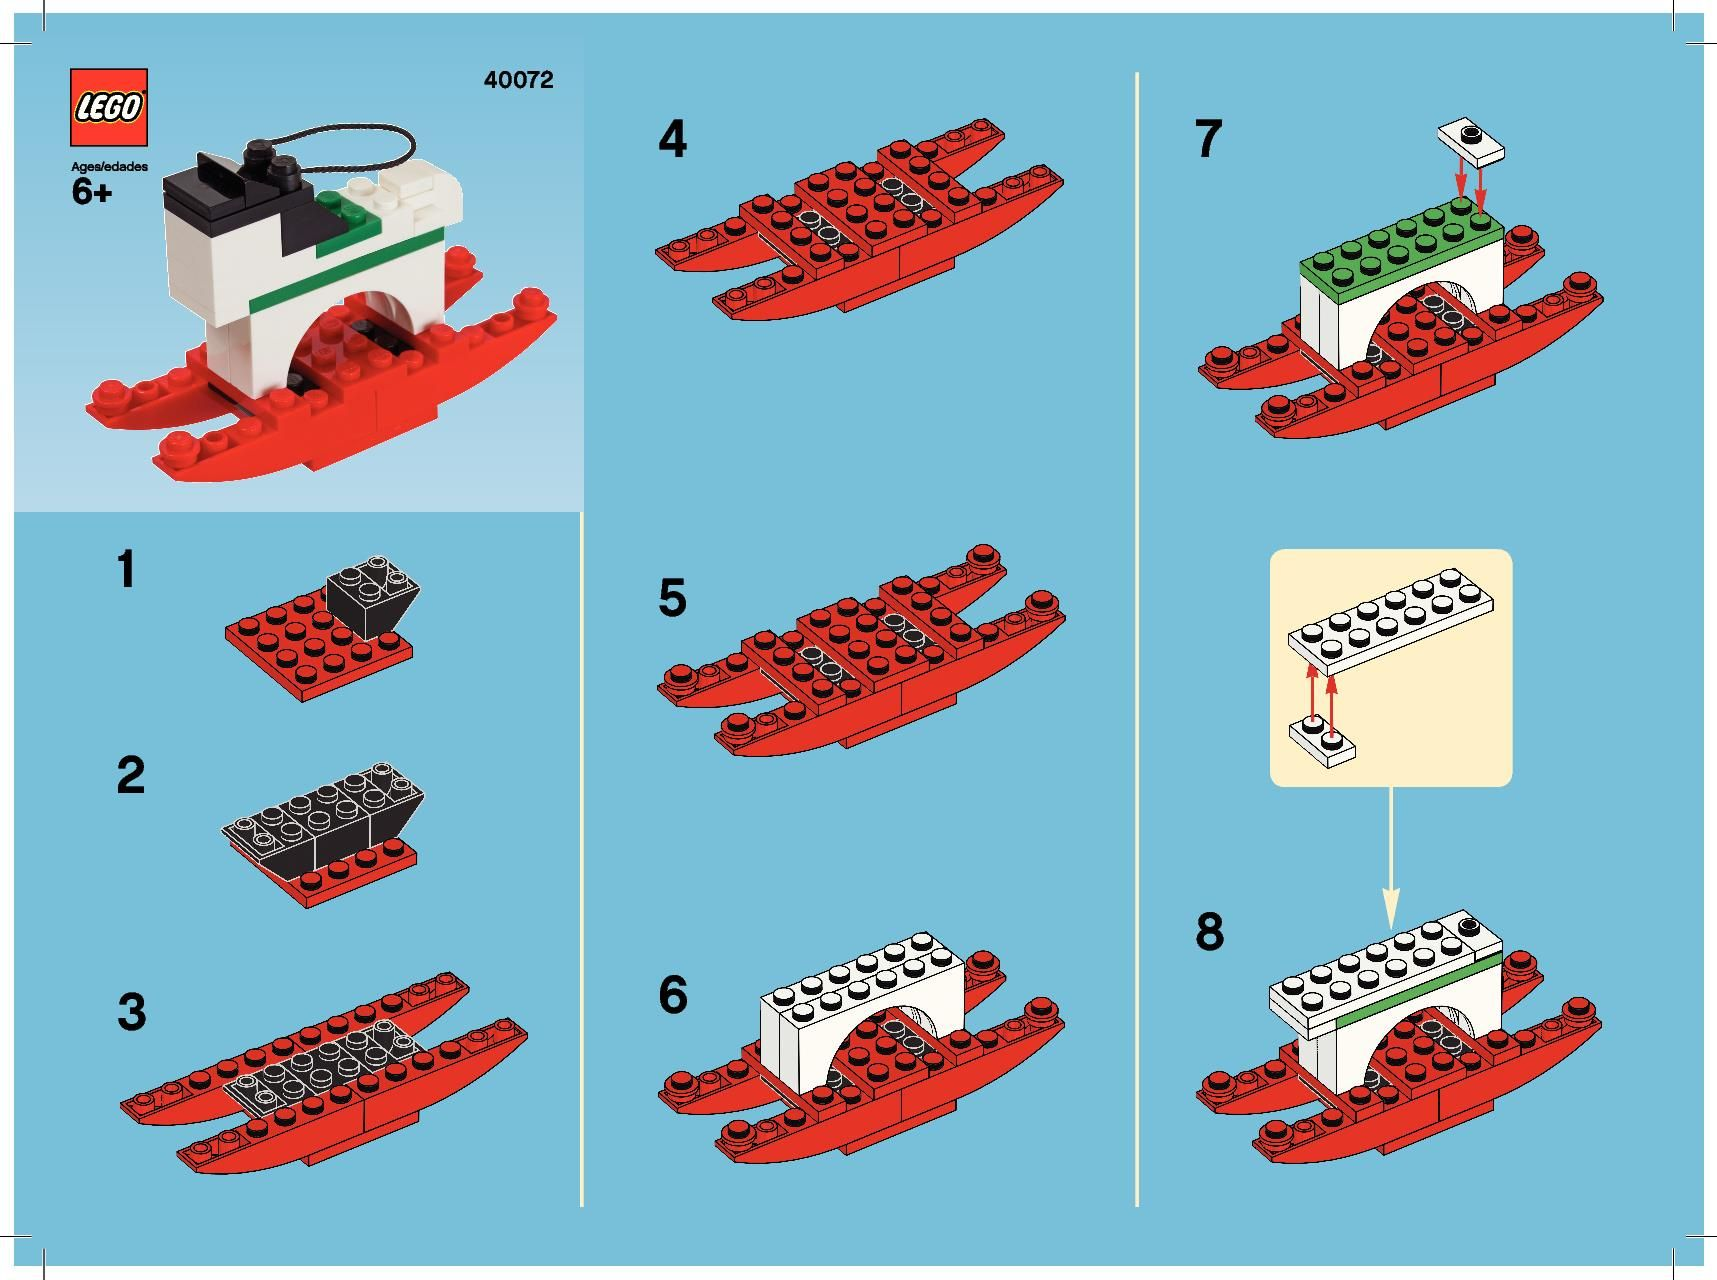 lego 6743 instructions pdf